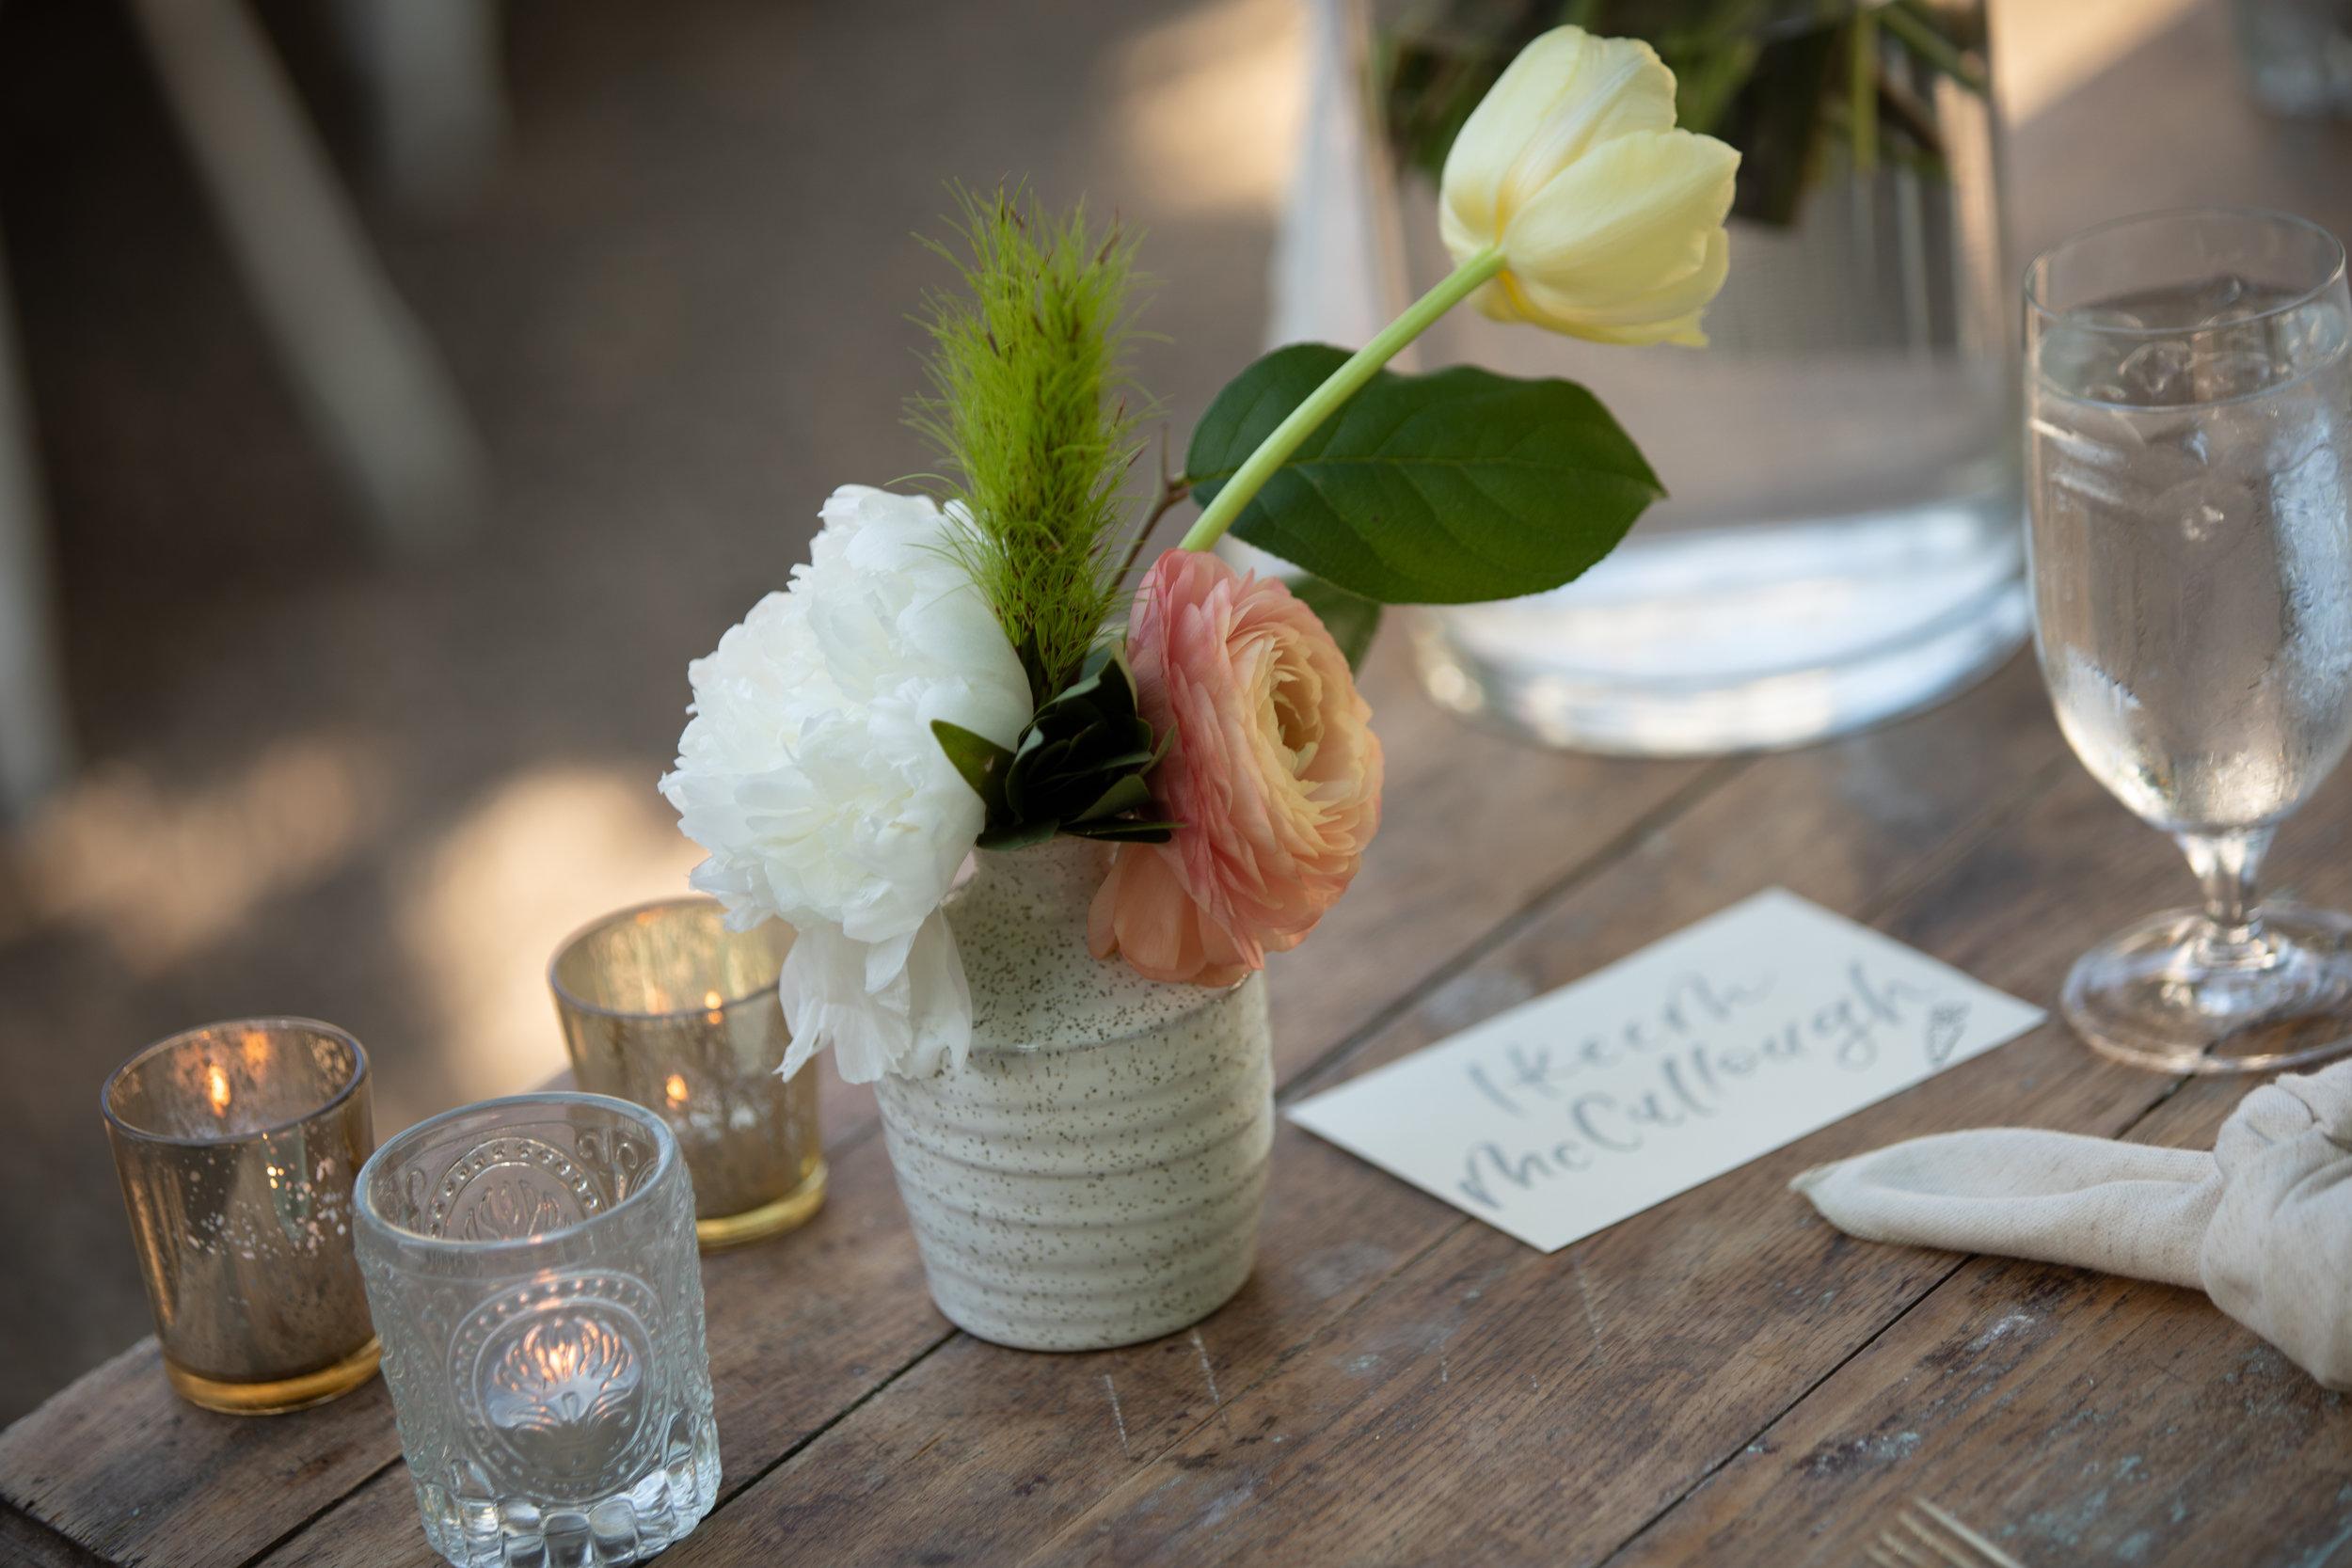 sarah_ikeem_wedding_at_the_parlour_at_manns_chapel_05.18.19-1014.jpg